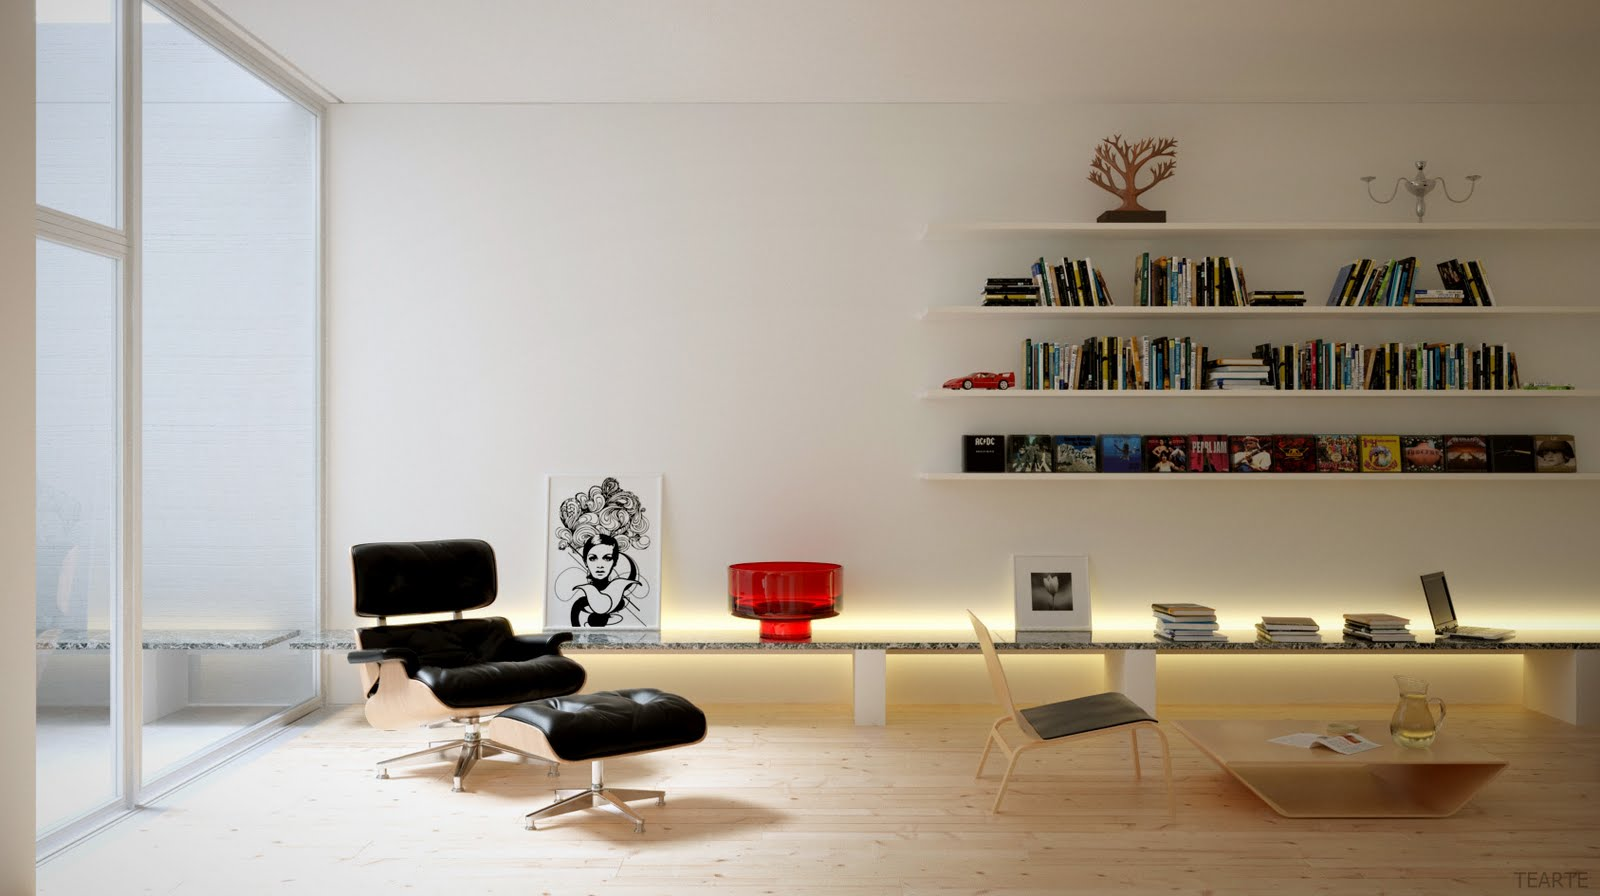 Rendered minimalist spaces by rafael reis - Minimalist interior design living room ...